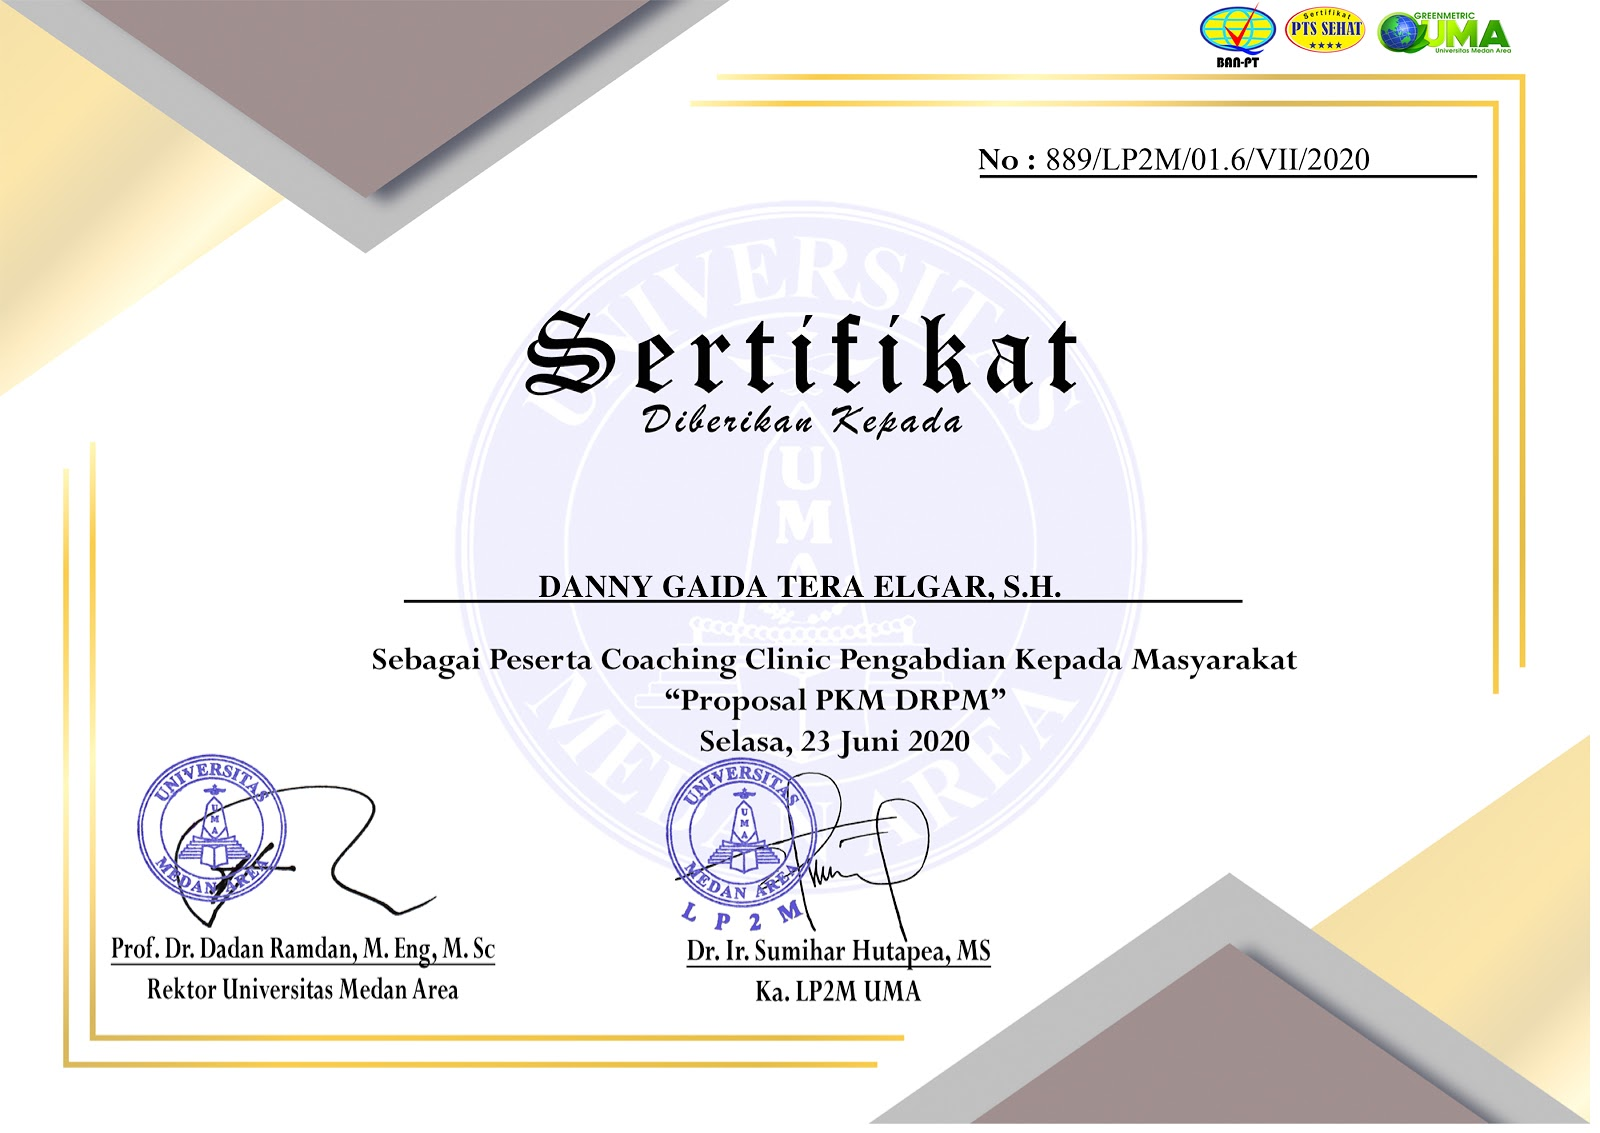 Sertifikat Proposal PKM DRPM Universitas Medan Area (UMA) | Selasa, 23 Juni 2020